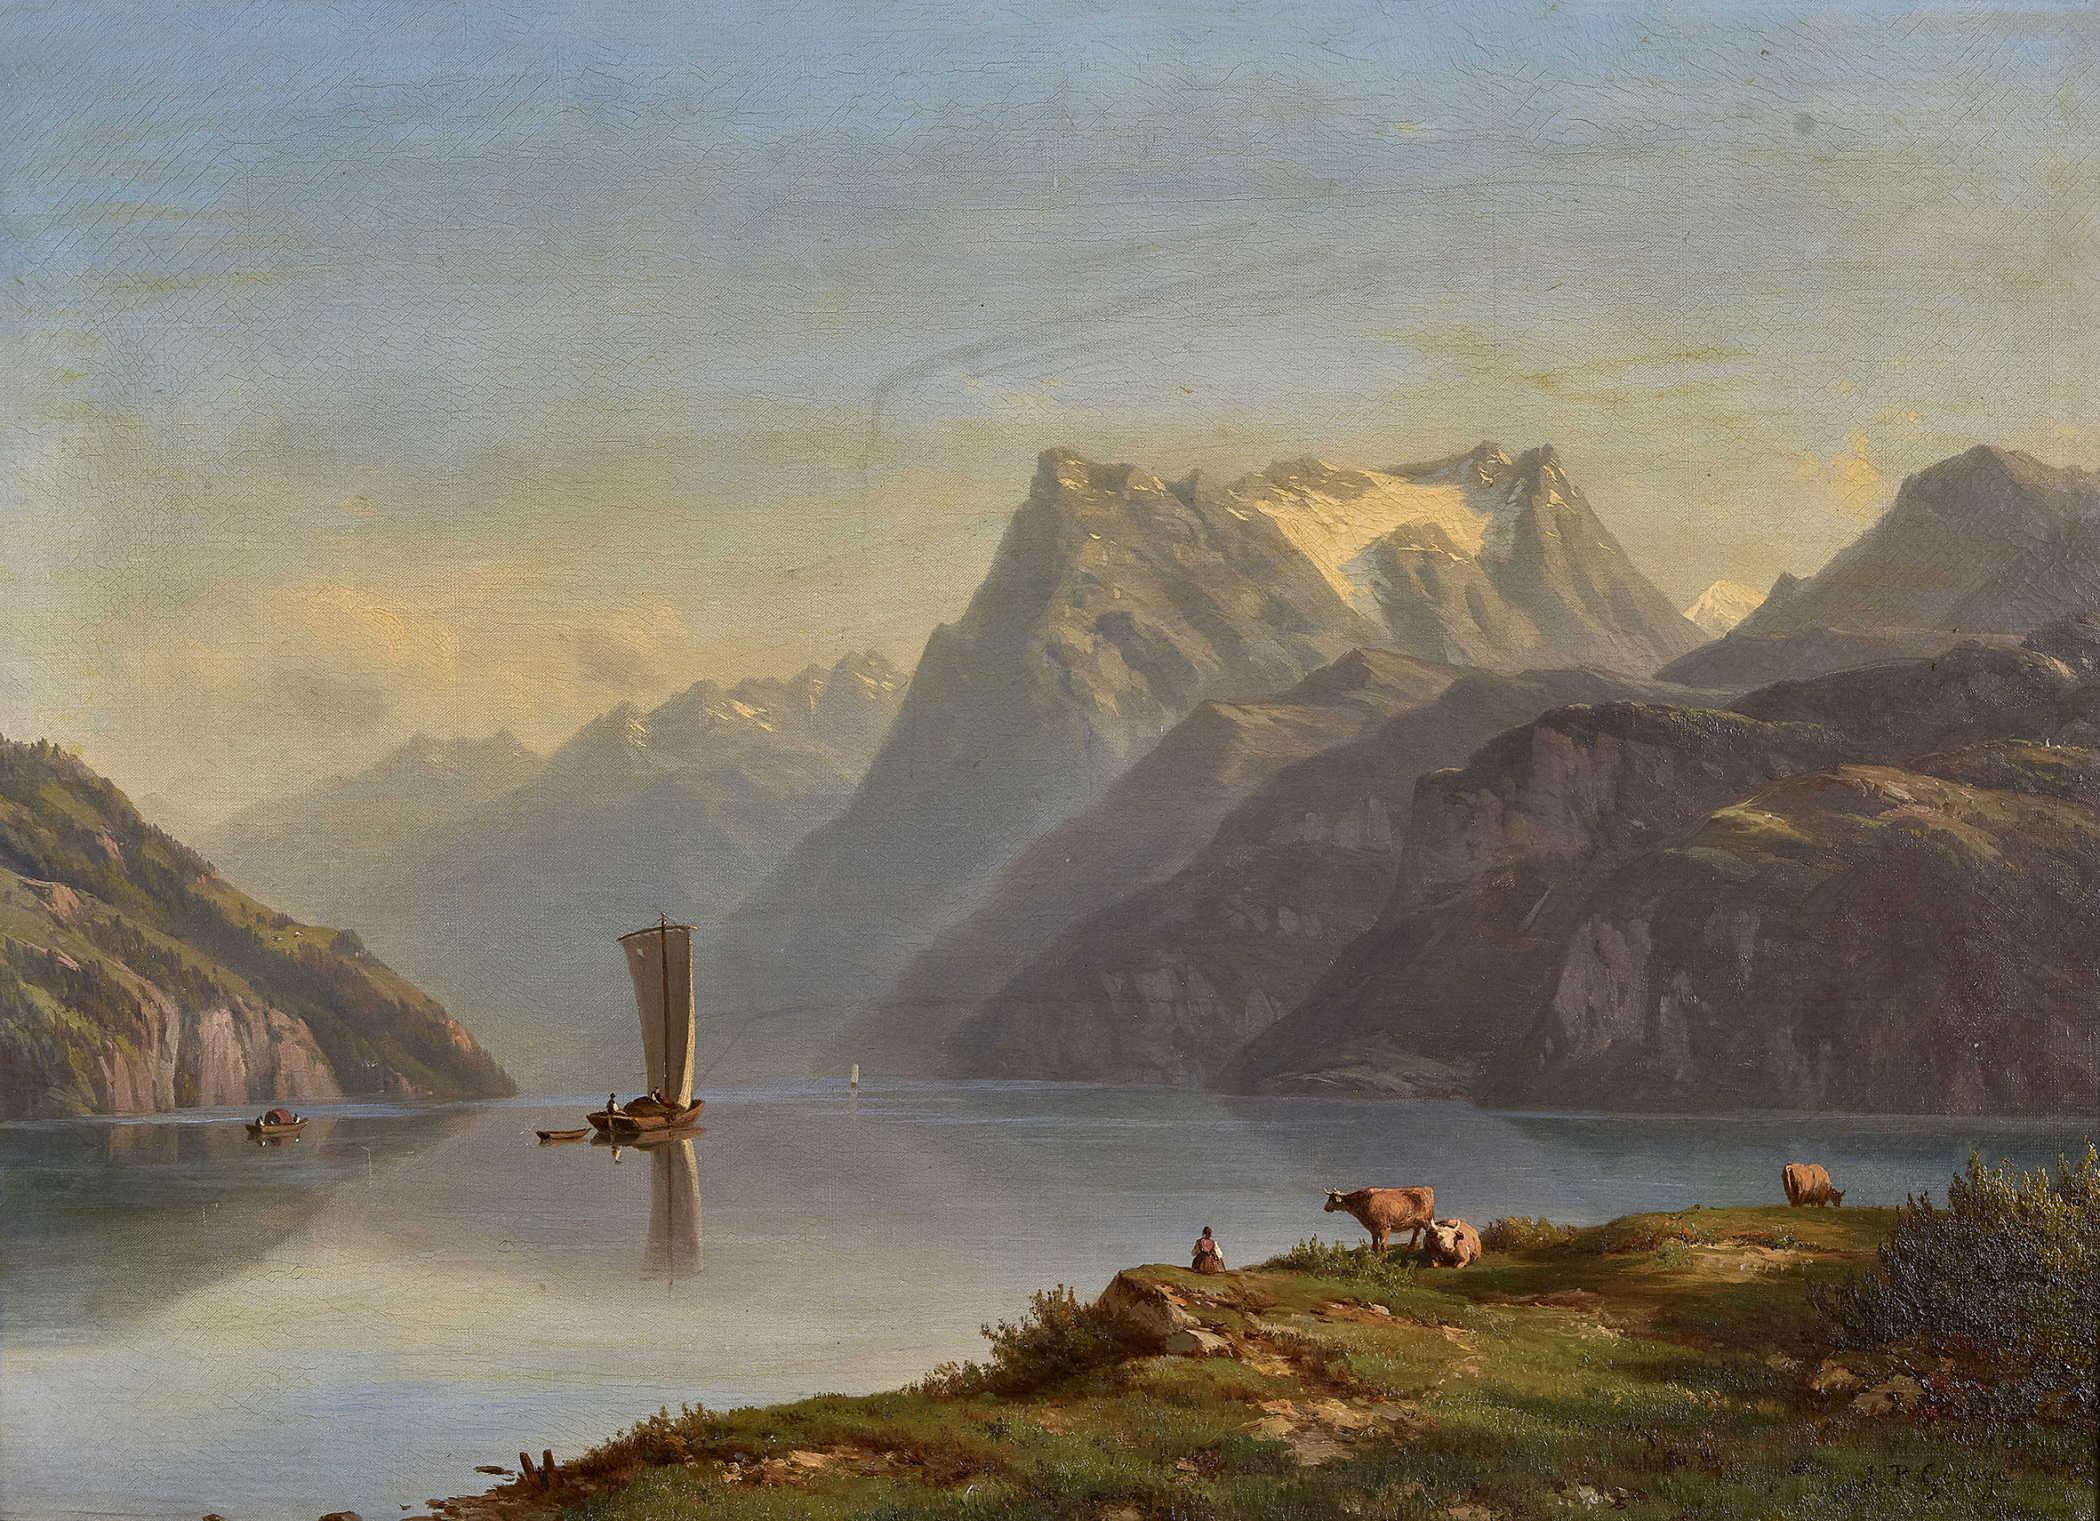 Lot 8 - GEORGE-JULLIARD, JEAN PHILIPPE1818 Genève 1888Vierwaldstättersee mit Urirotstock.Öl auf Leinwand,